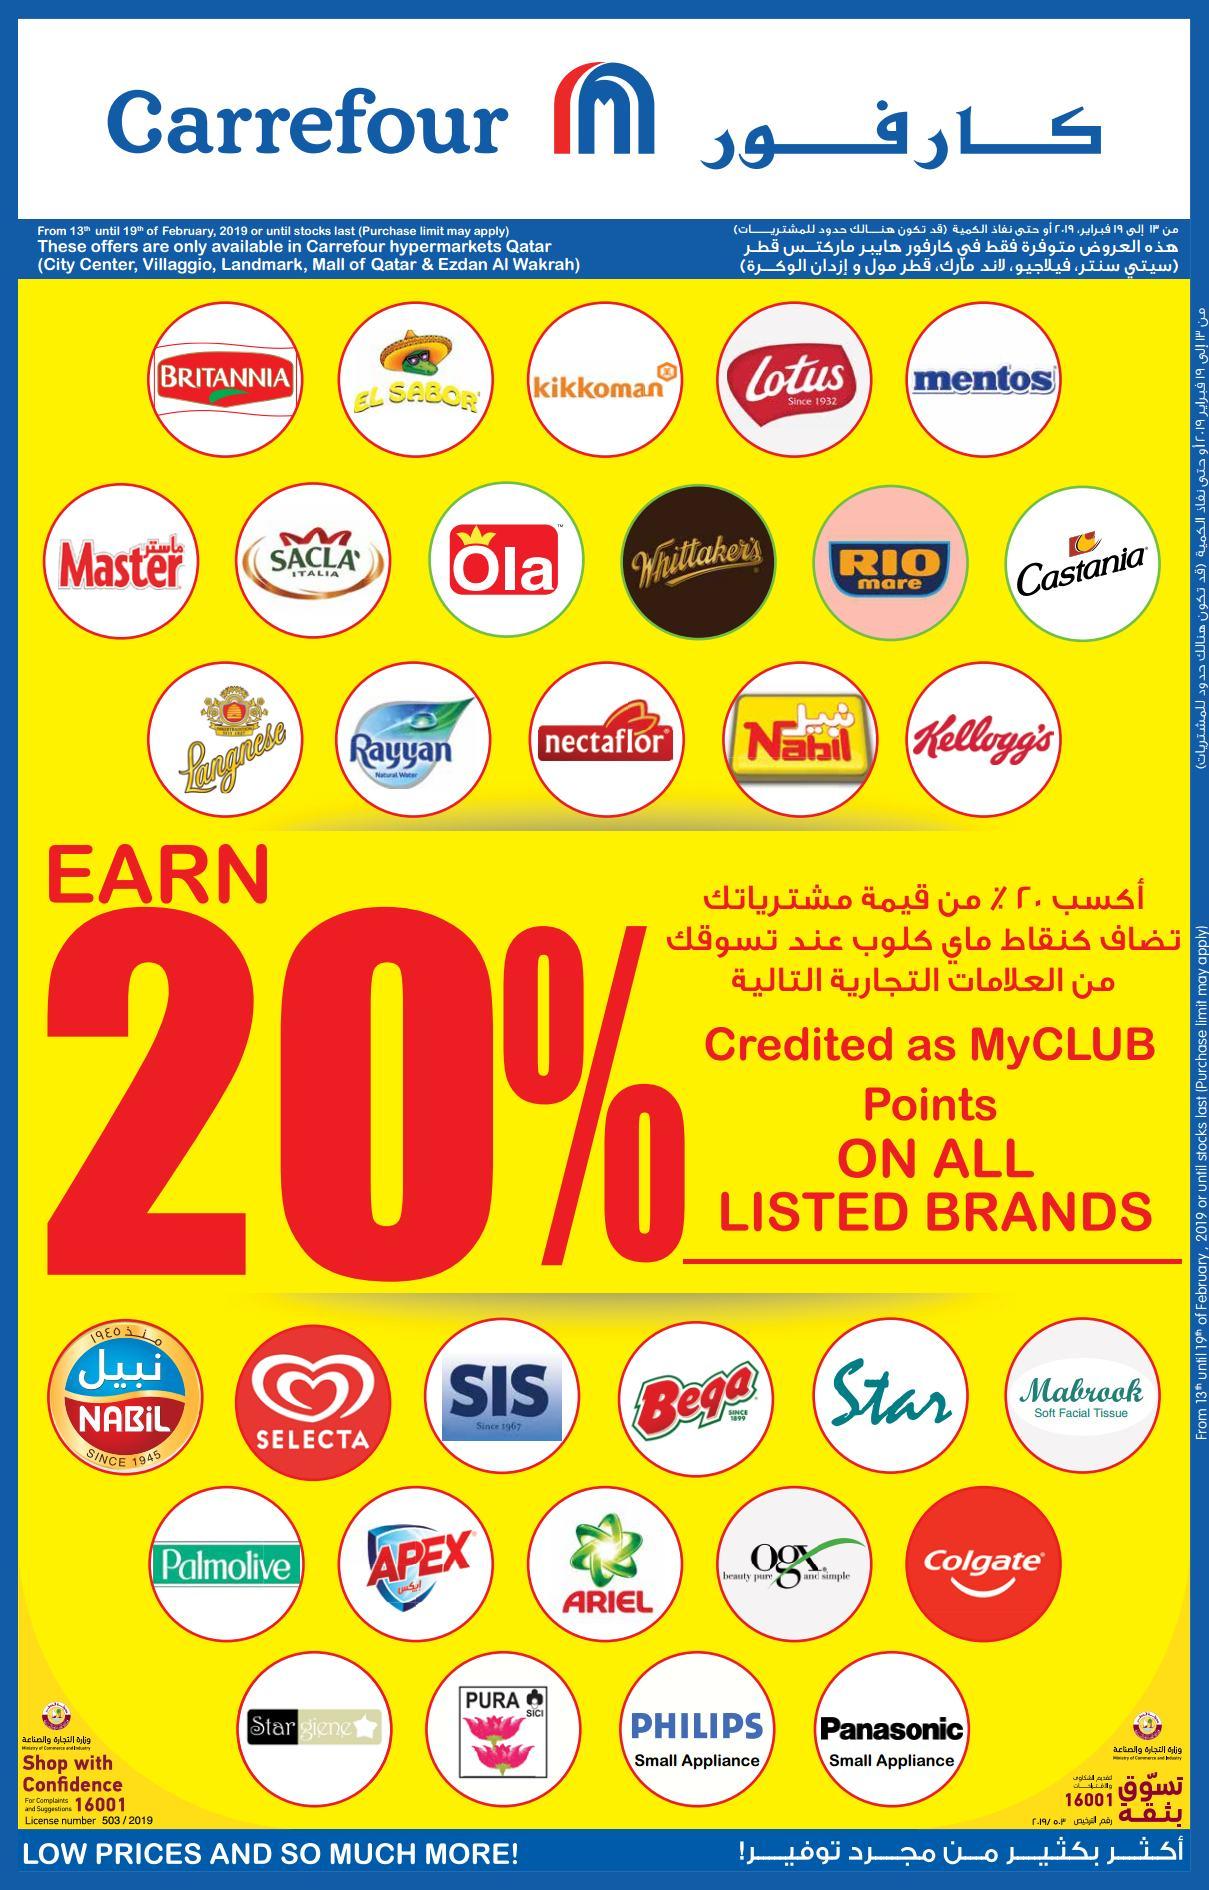 Carrefour Hypermarket Offer till 12-20